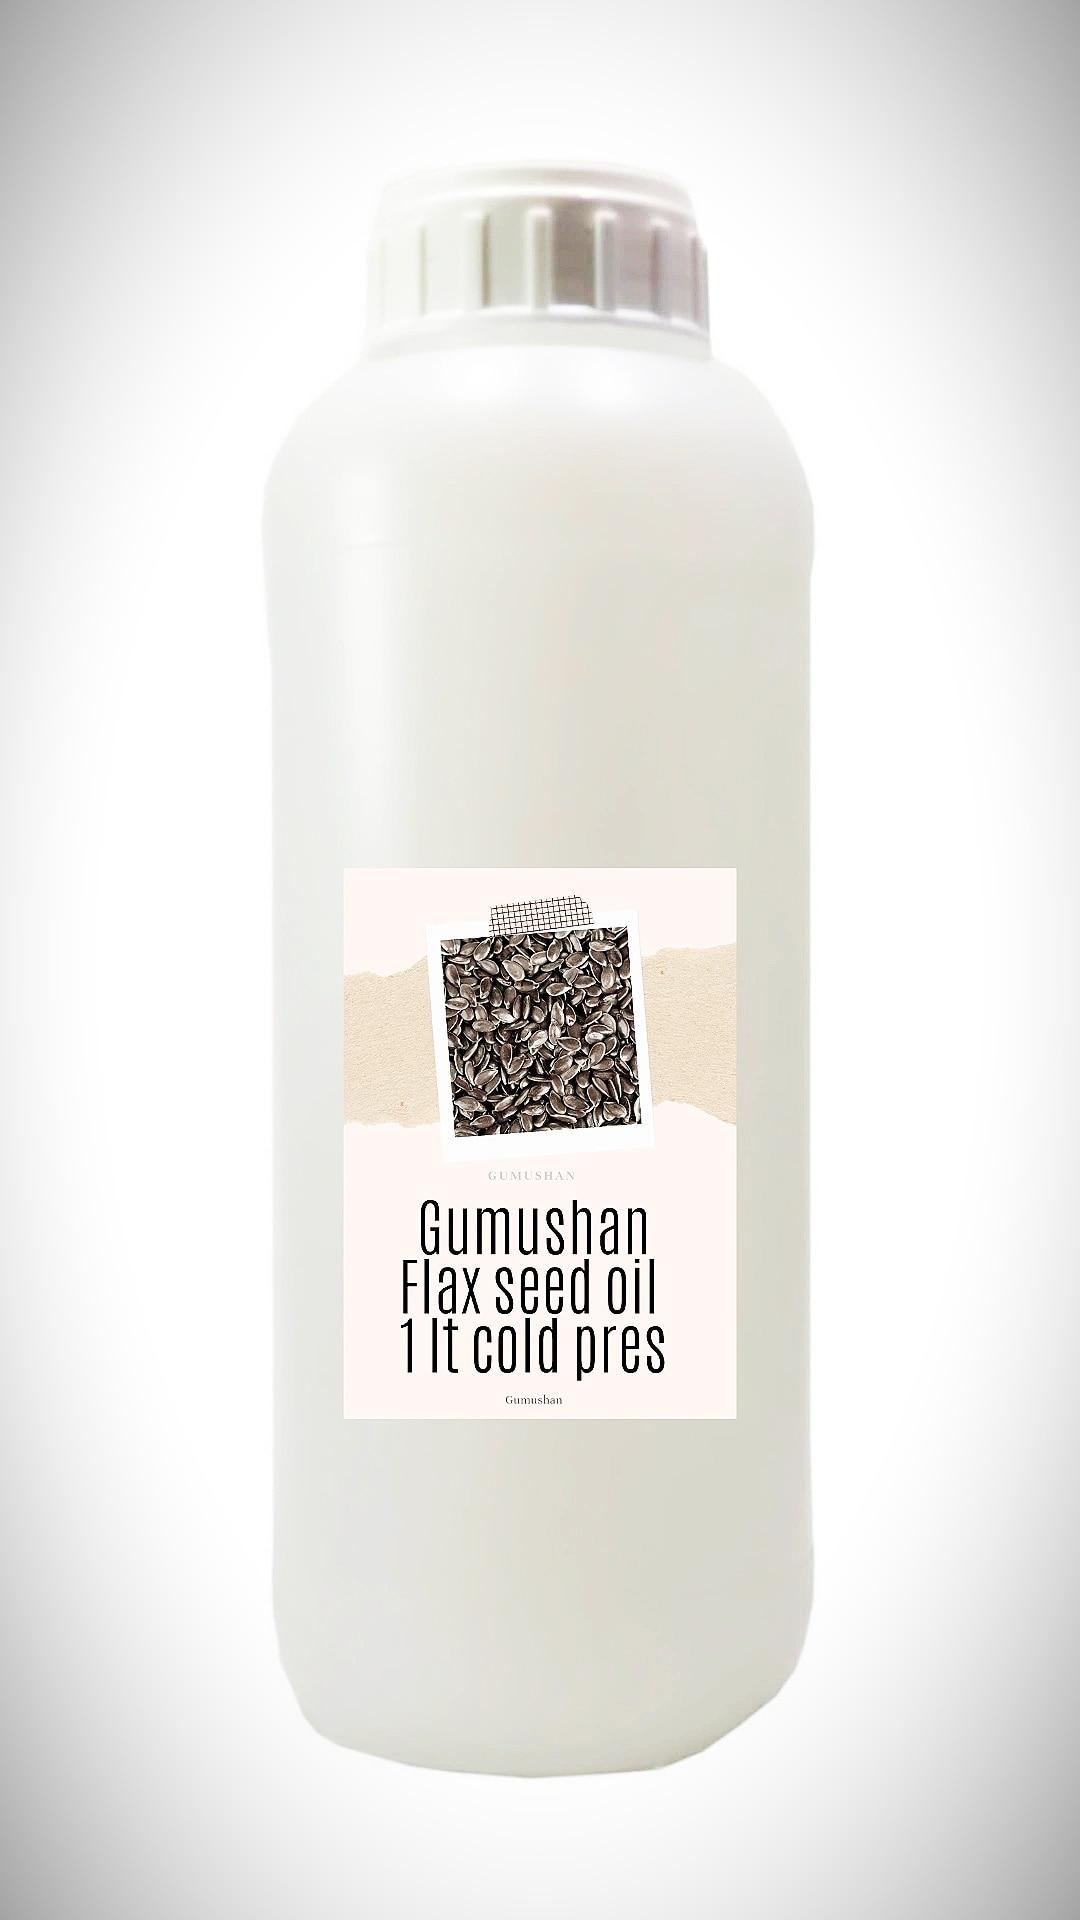 High quality pure Flax Seed Oil 1 liter 34 fl oz 1000ml